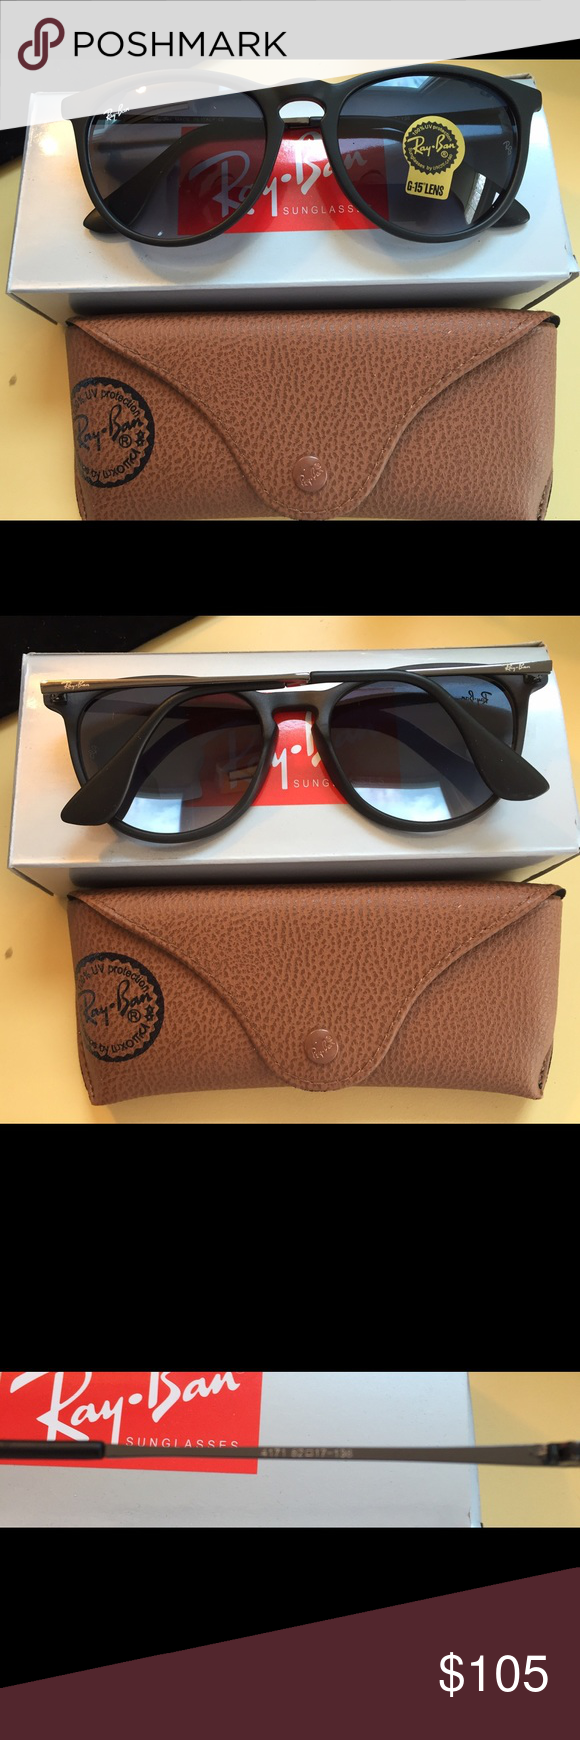 Ray Ban sunglasses 4171 Black Authentic new Ray Ban sunglasses 4171 ...